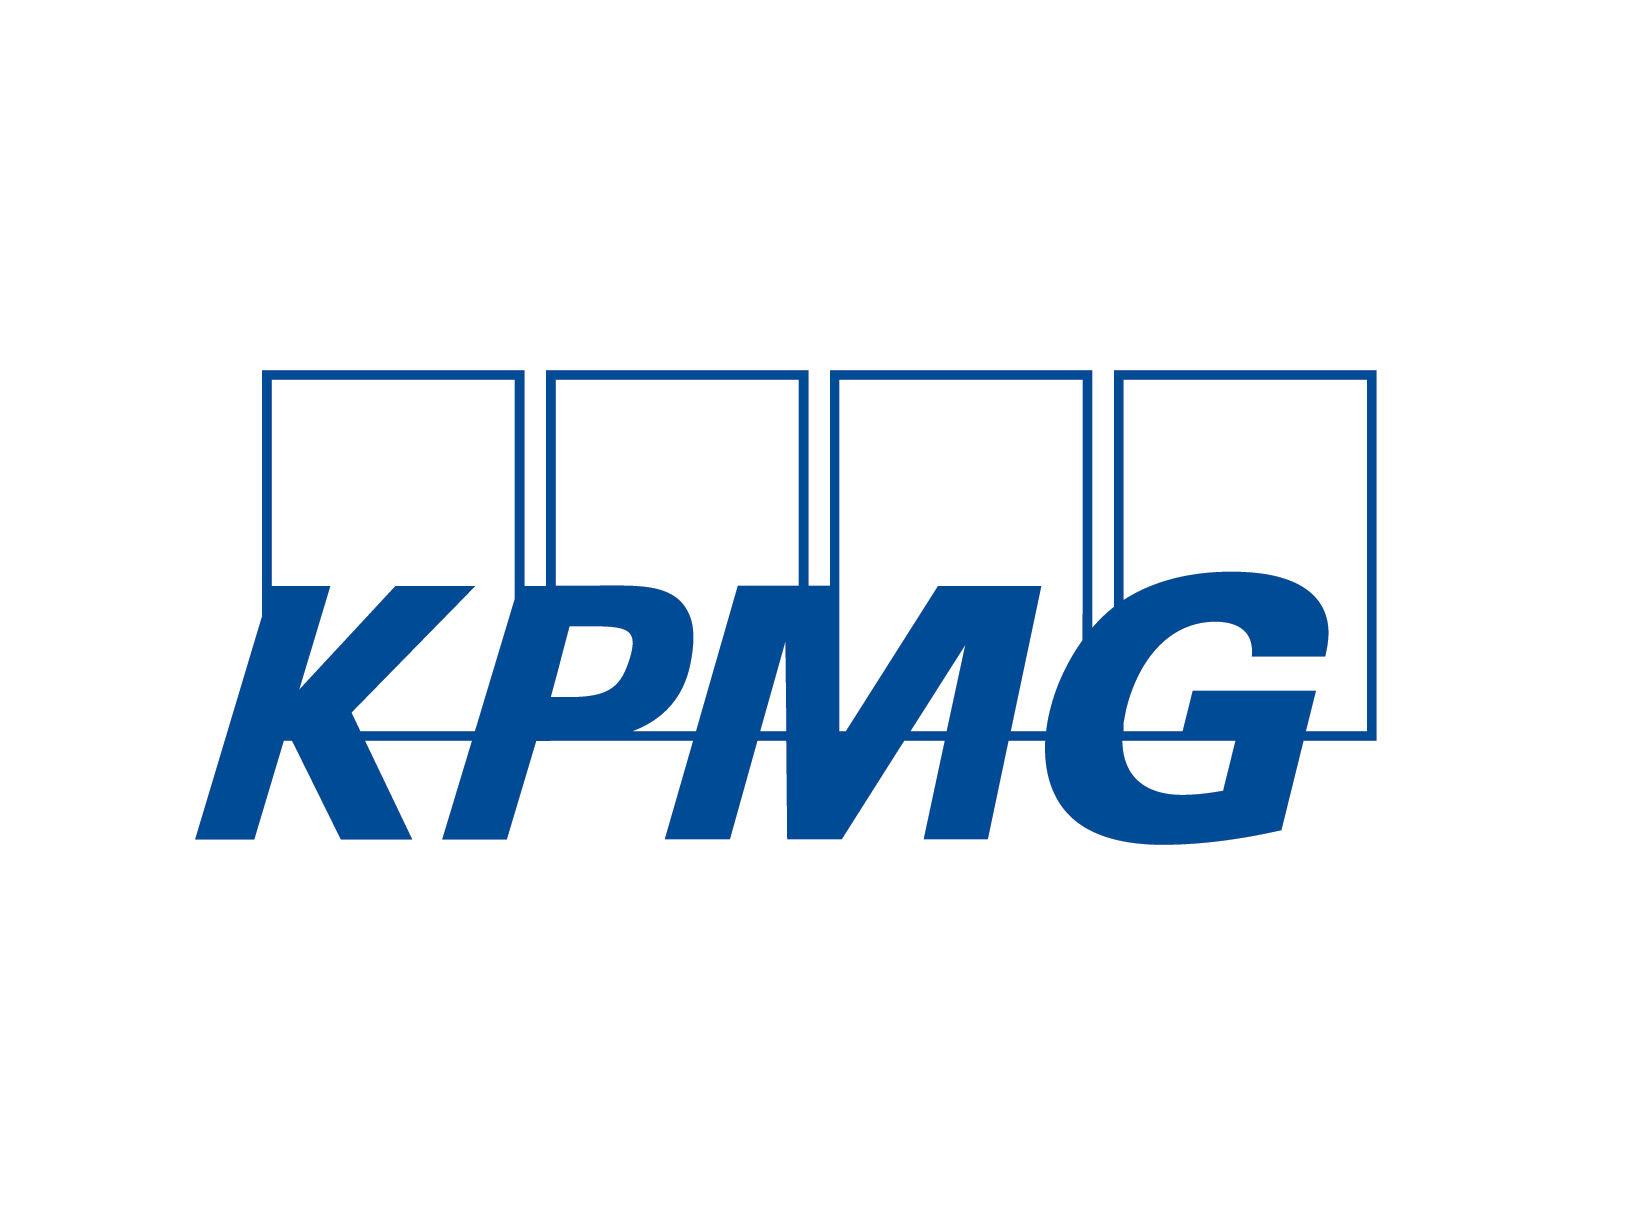 KPMG.new2016.jpg